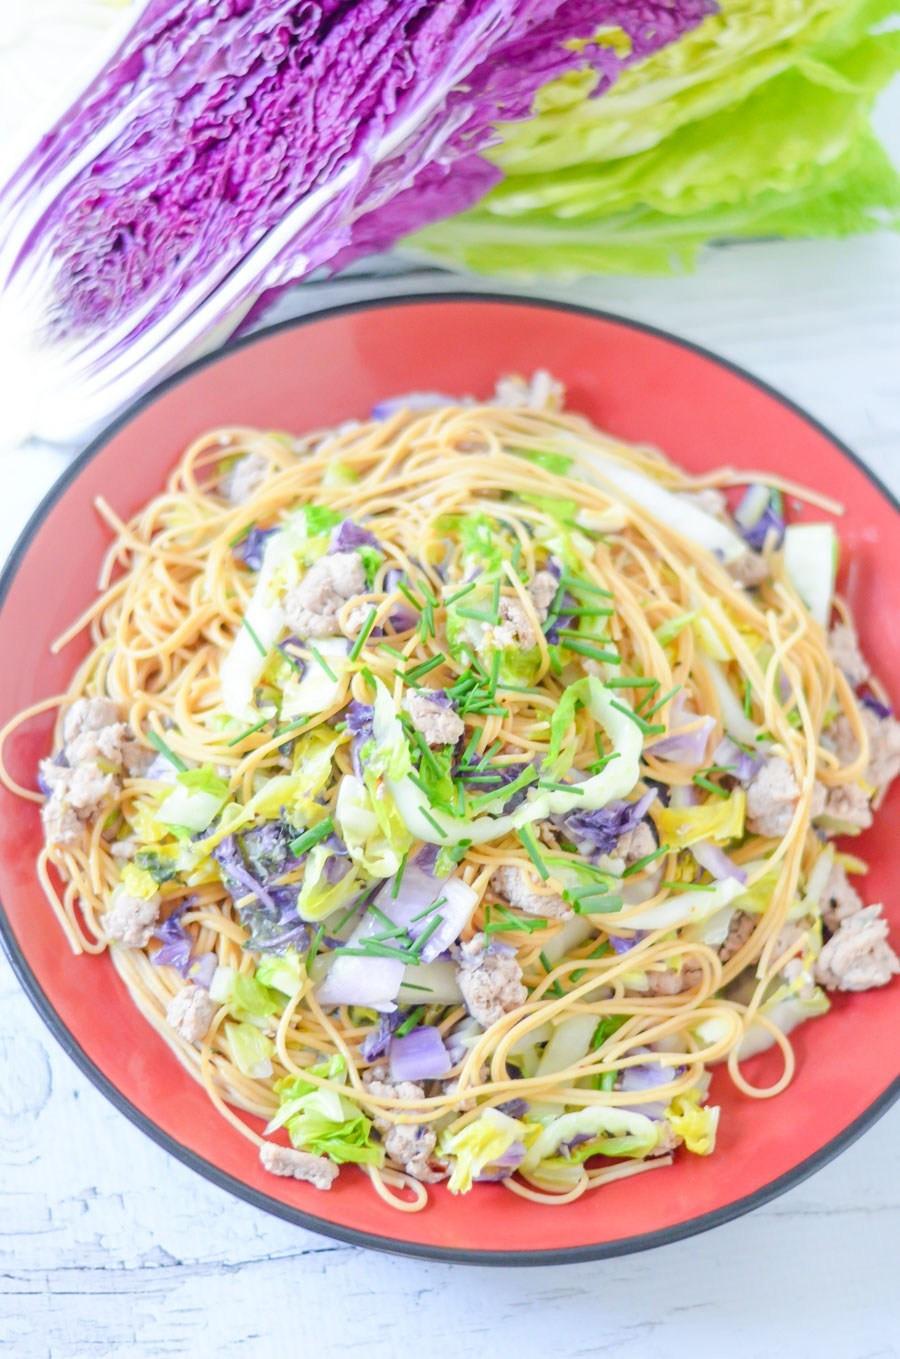 Healthy Ground Turkey Pasta Recipes  Cabbage and Pasta